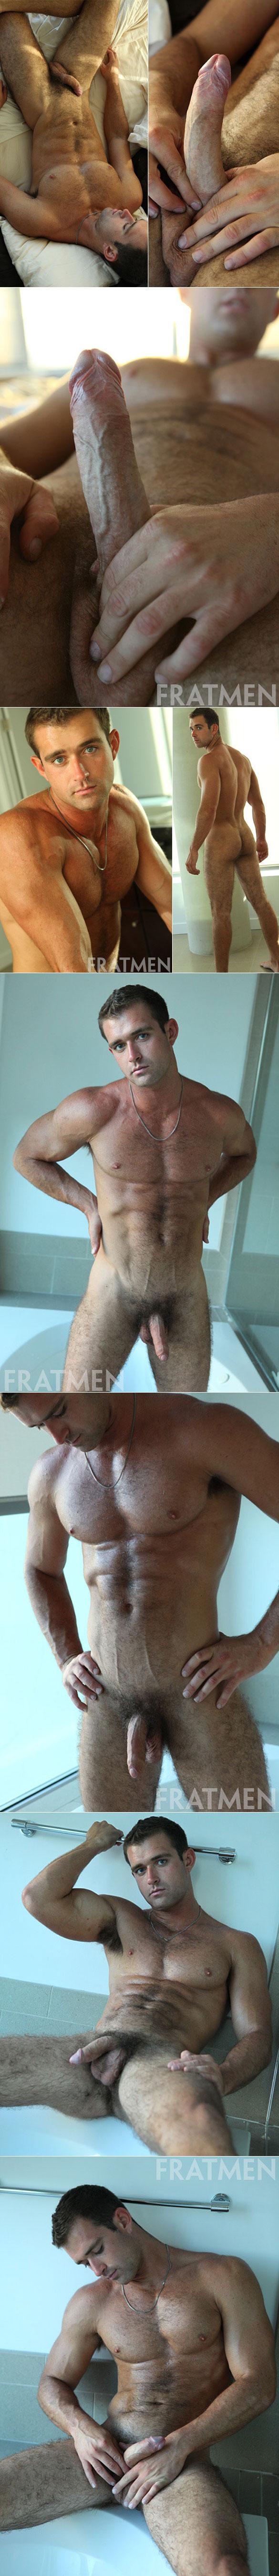 Fratmen.tv: Raphael up-close